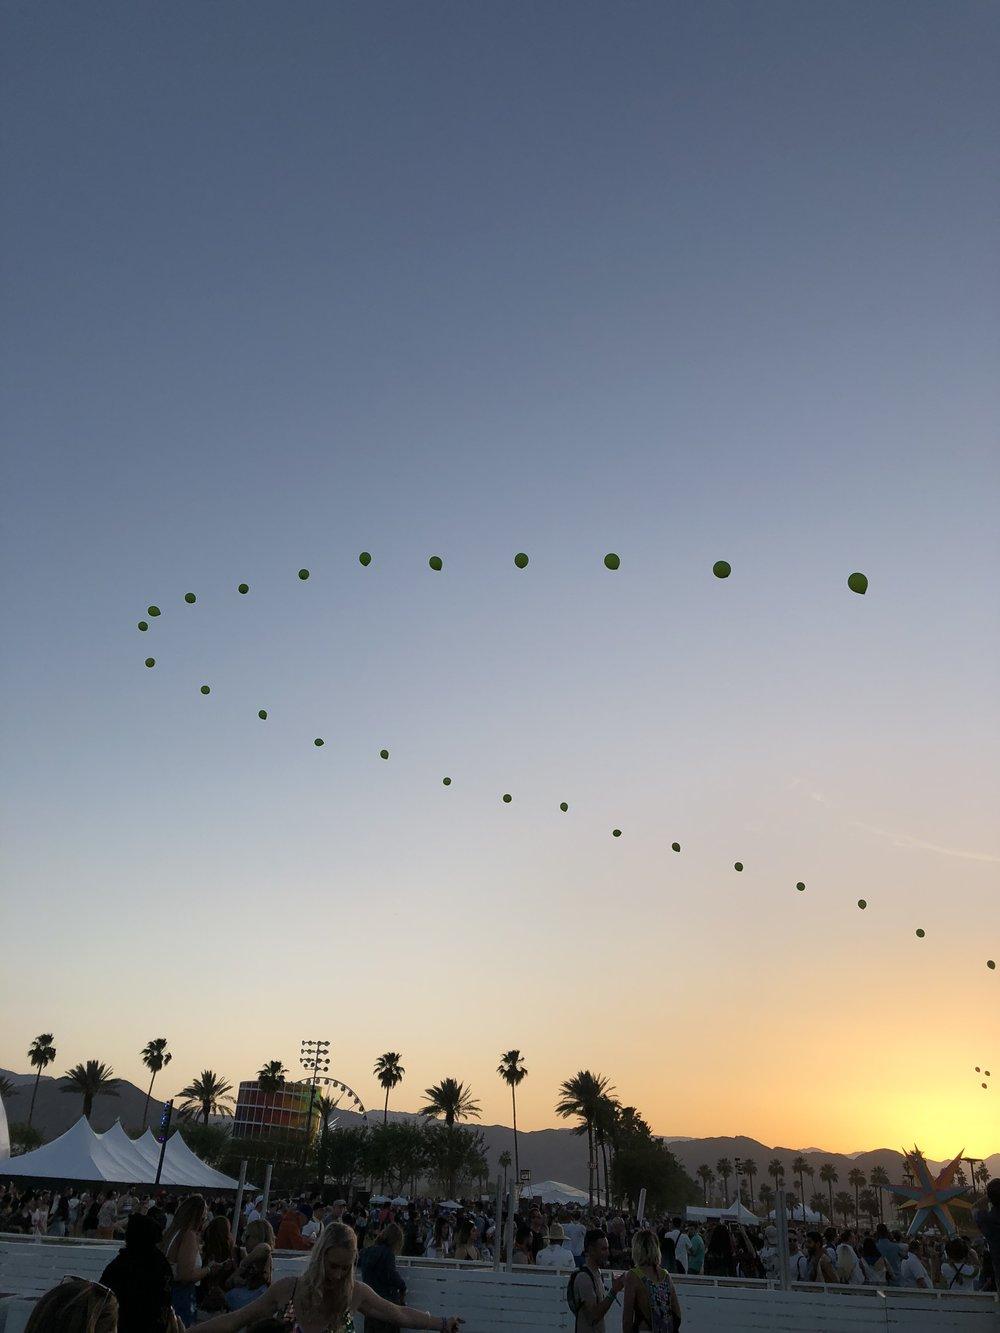 The-Look-Principle-Coachella-Looks-And-Tips-5jpg